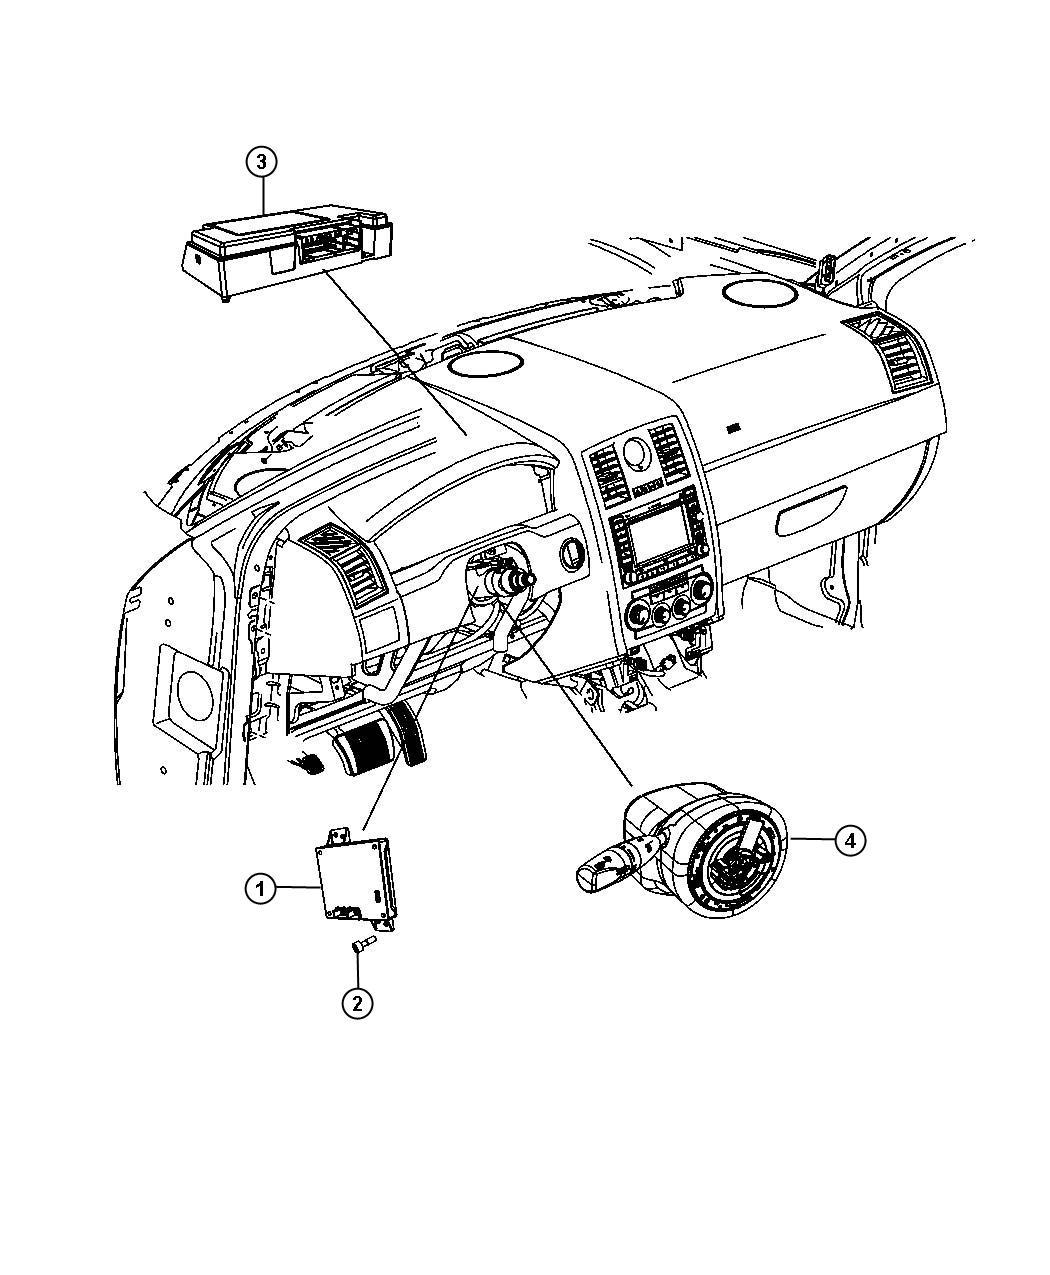 2015 Jeep Compass Module. Export. Telematics. Nav, radios